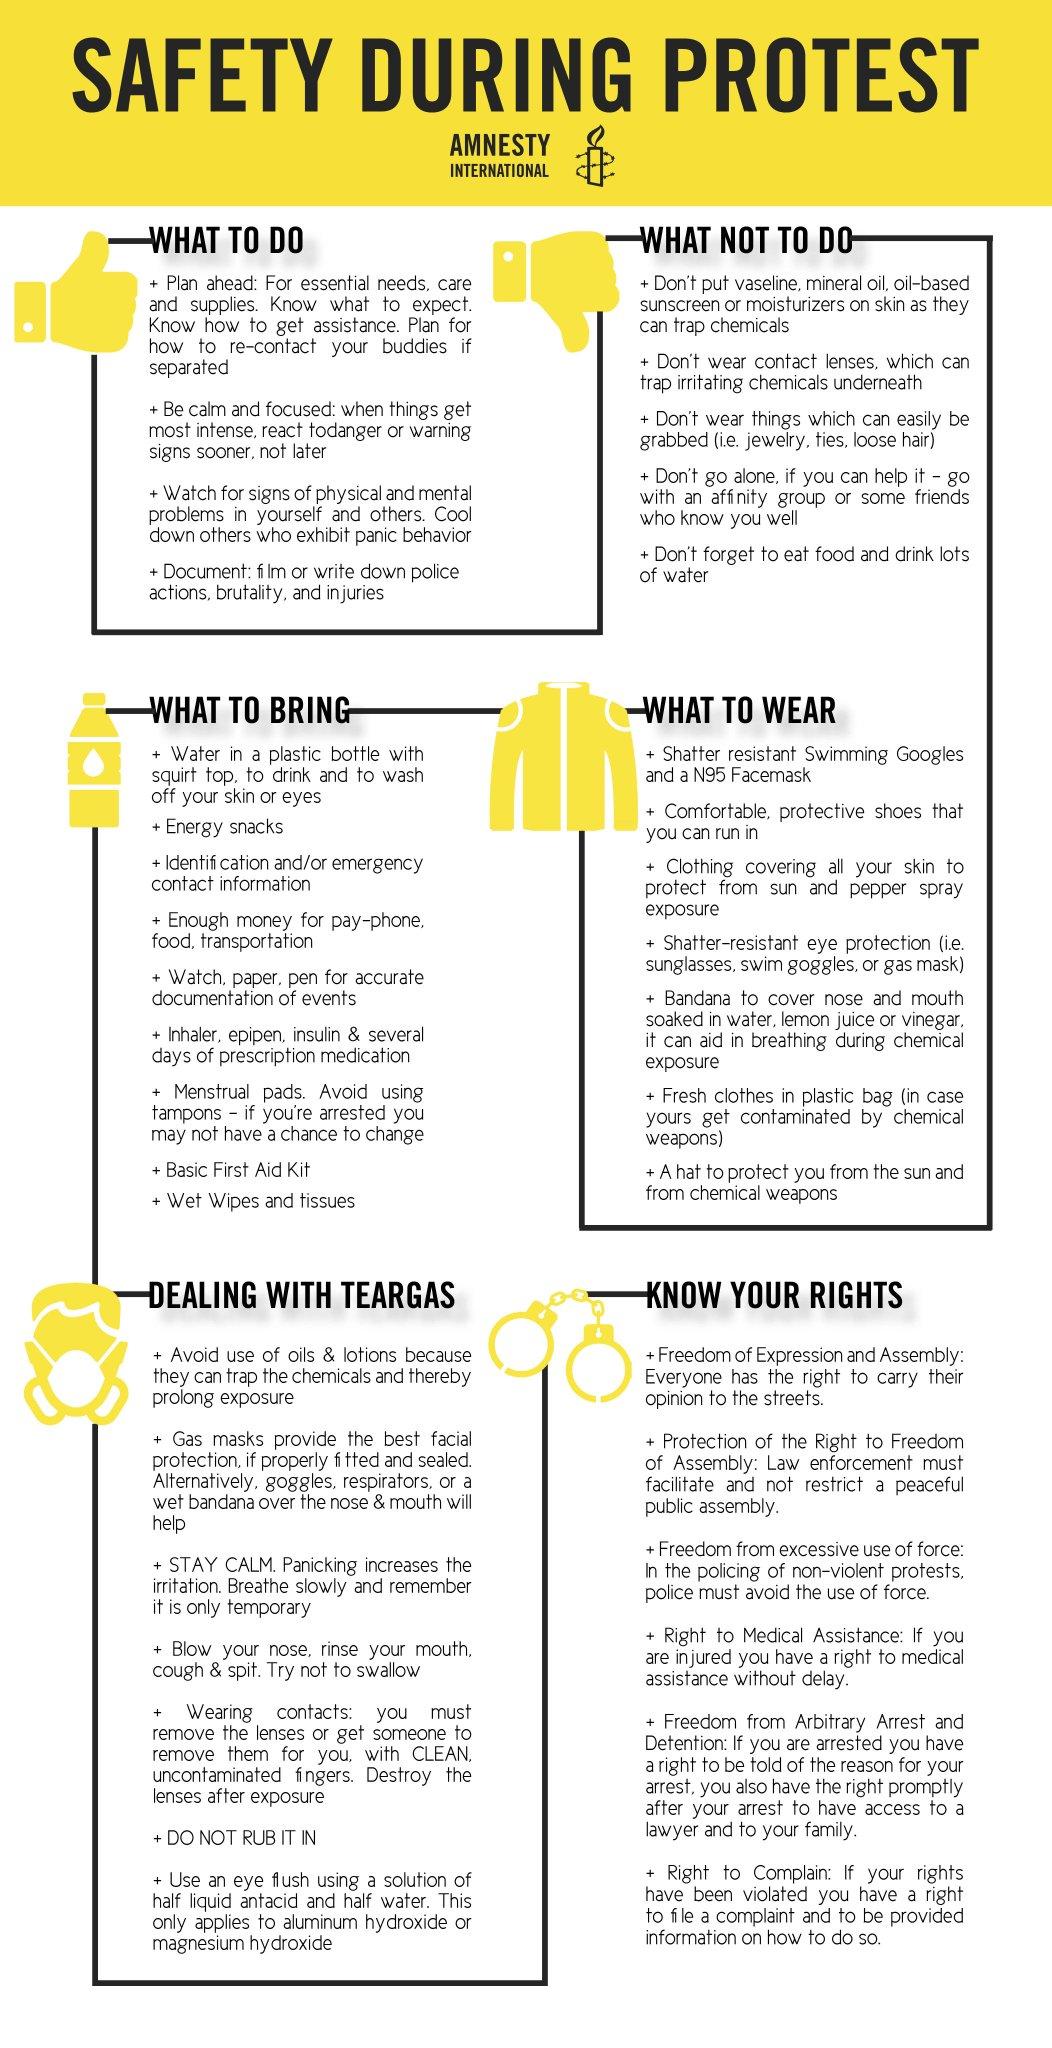 "Amnesty International USA on Twitter: ""Getting ready for ..."